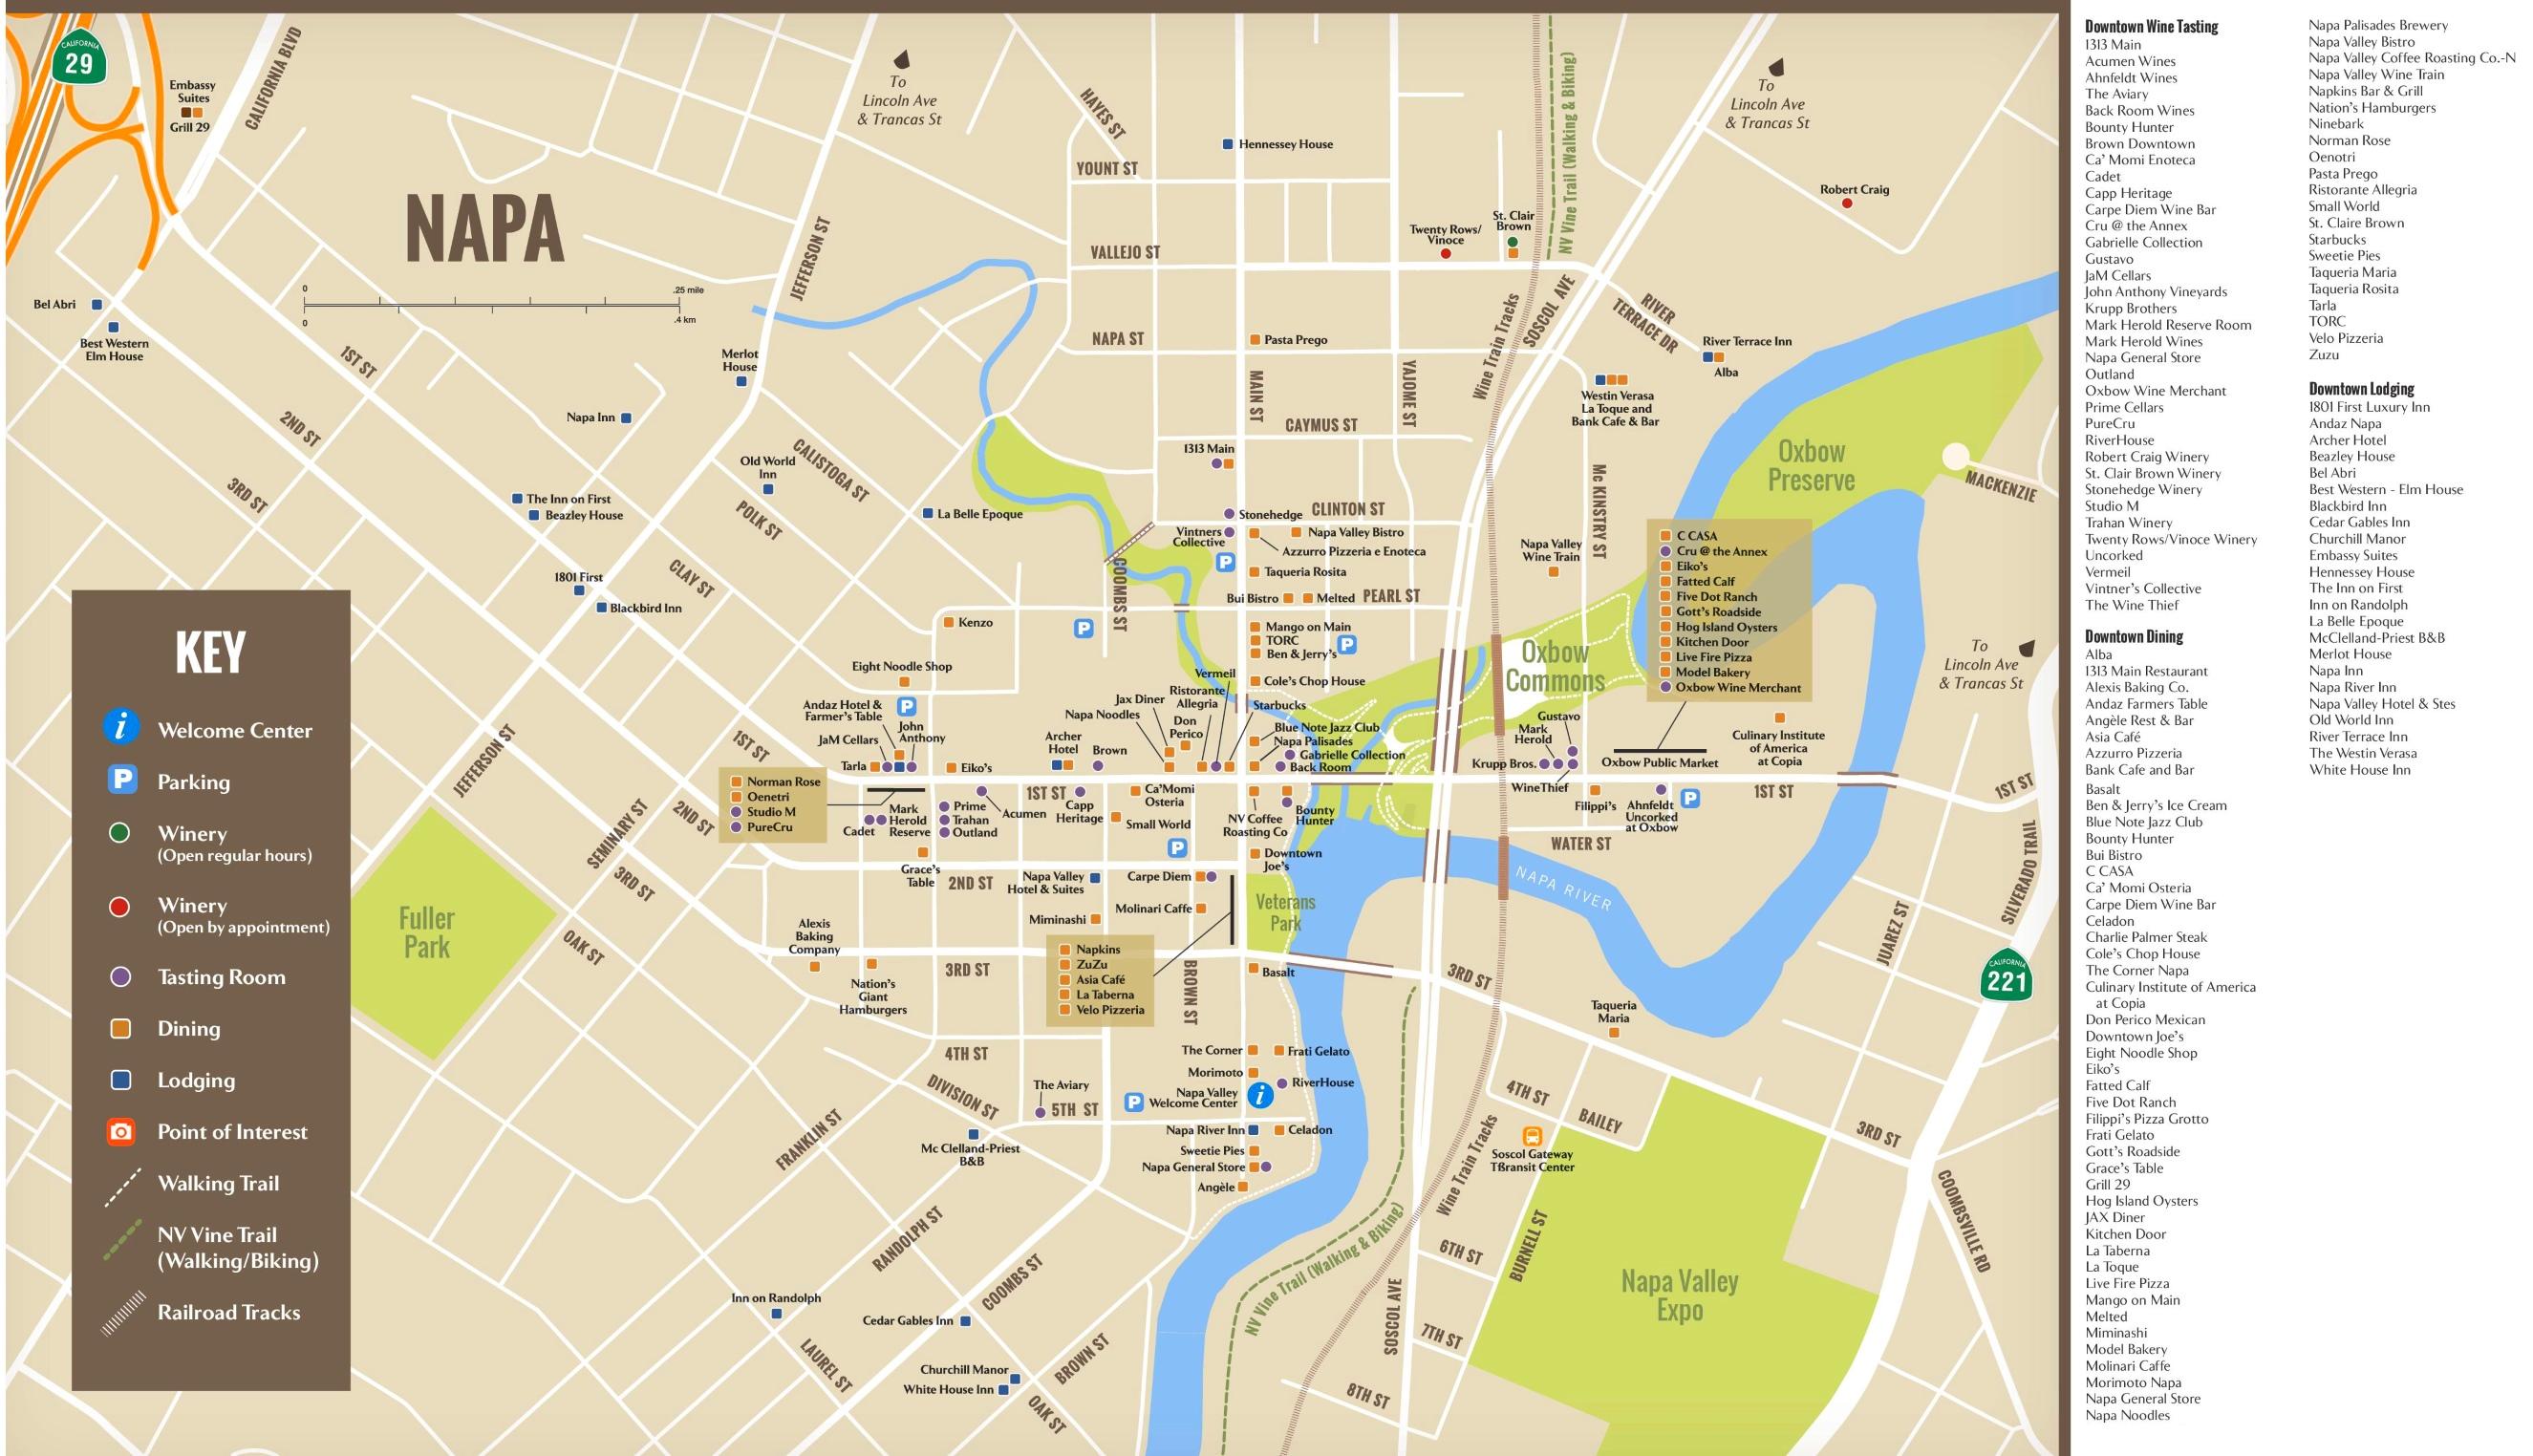 City Of Napa Hotels And Dining Map - Map of napa hotels